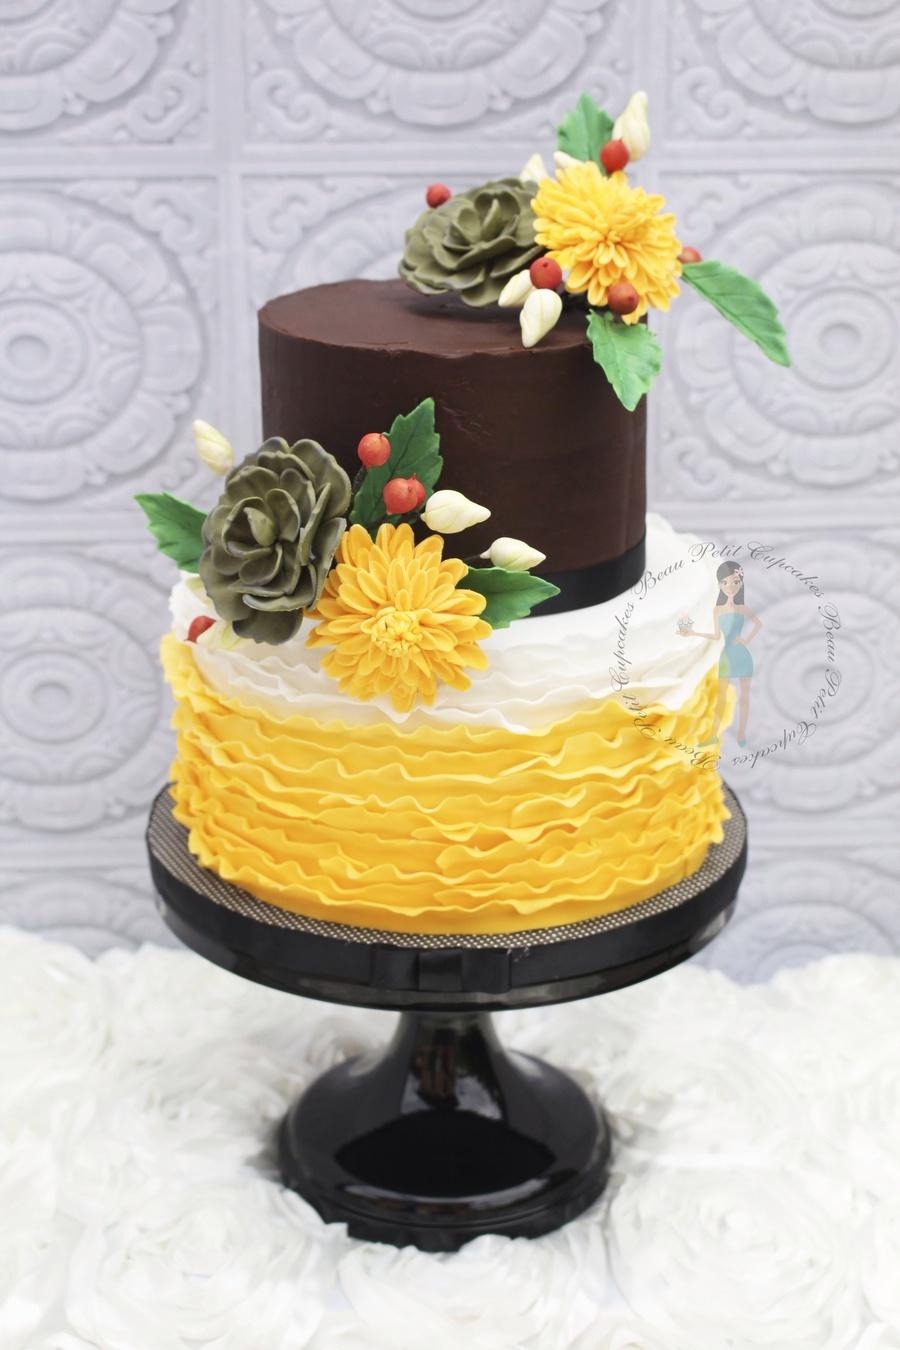 Rustic Ganache And Ruffled 90th Birthday Cake With Sugar